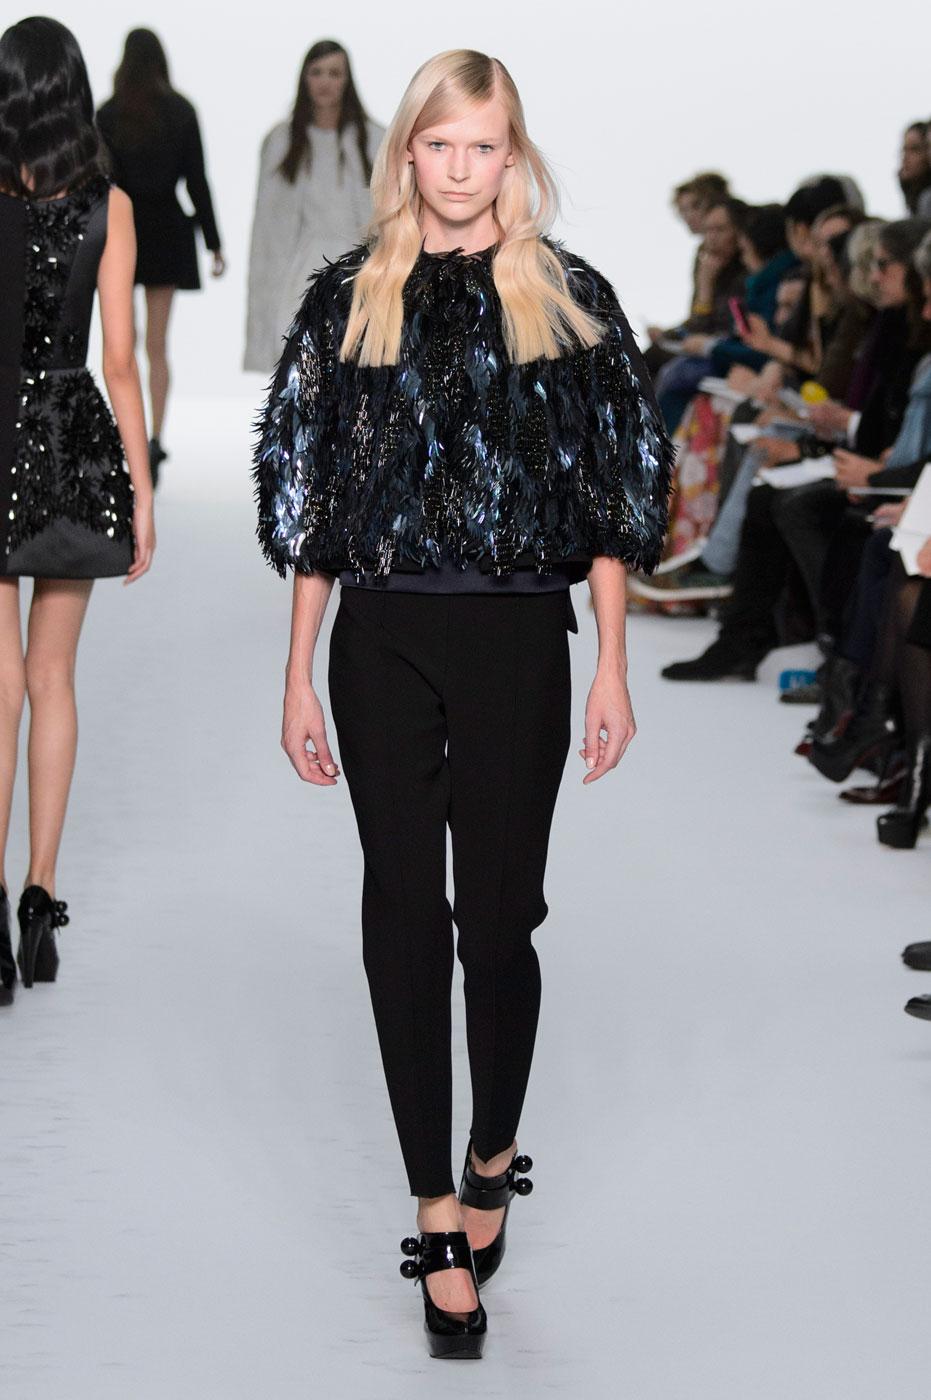 Kayek-fashion-runway-show-haute-couture-paris-spring-summer-2015-the-impression-43